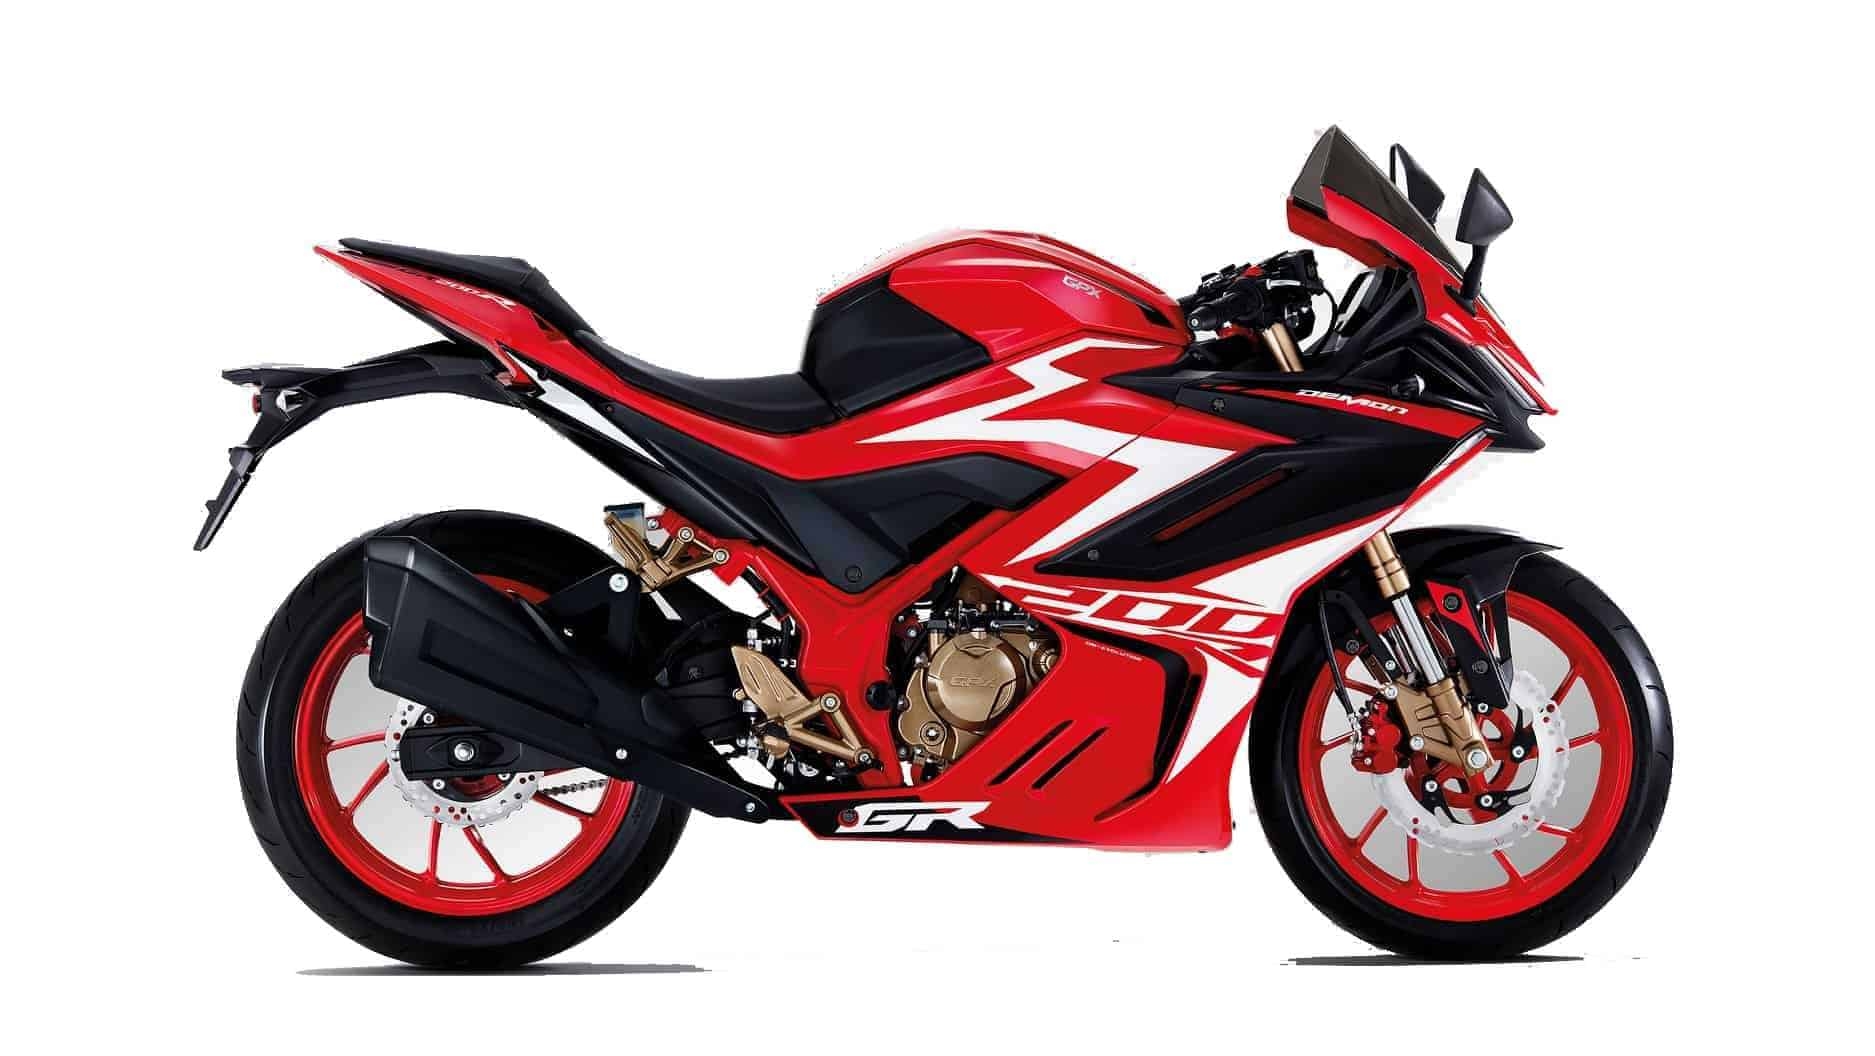 gpx demon gr200r colour red fire 1